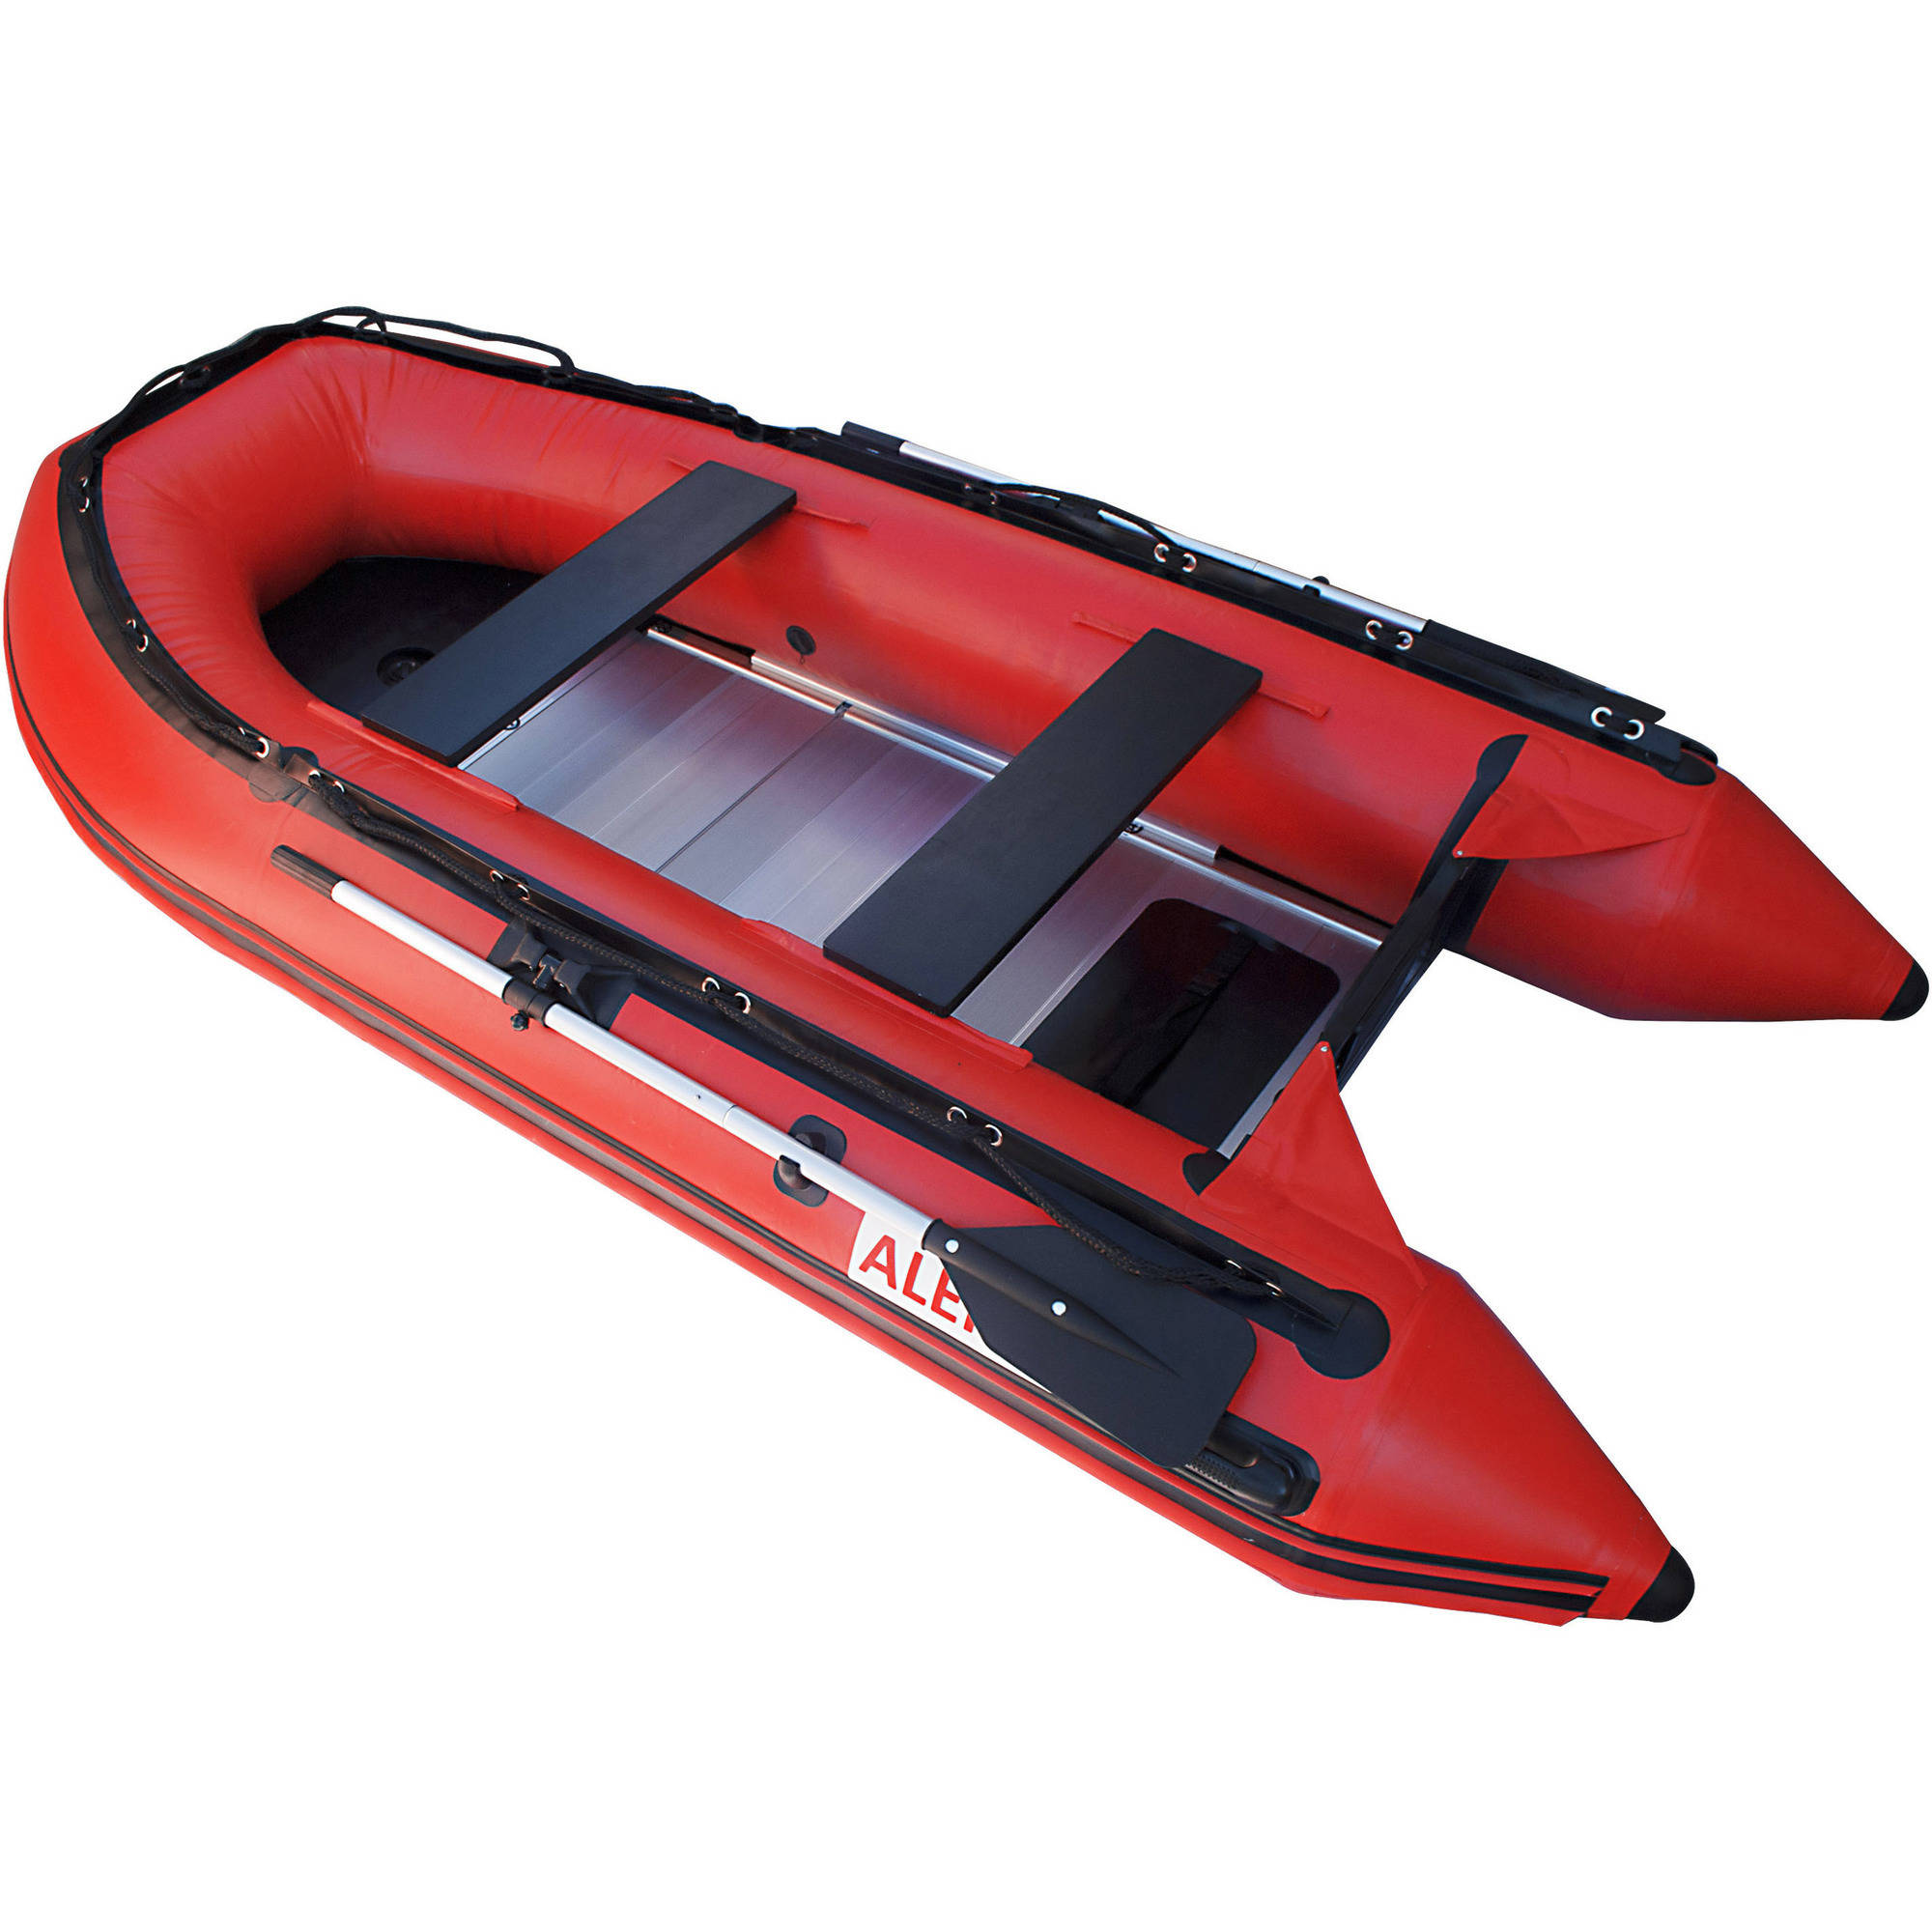 ALEKO Boat 12.5' Inflatable Boat with Aluminum Floor Heav...